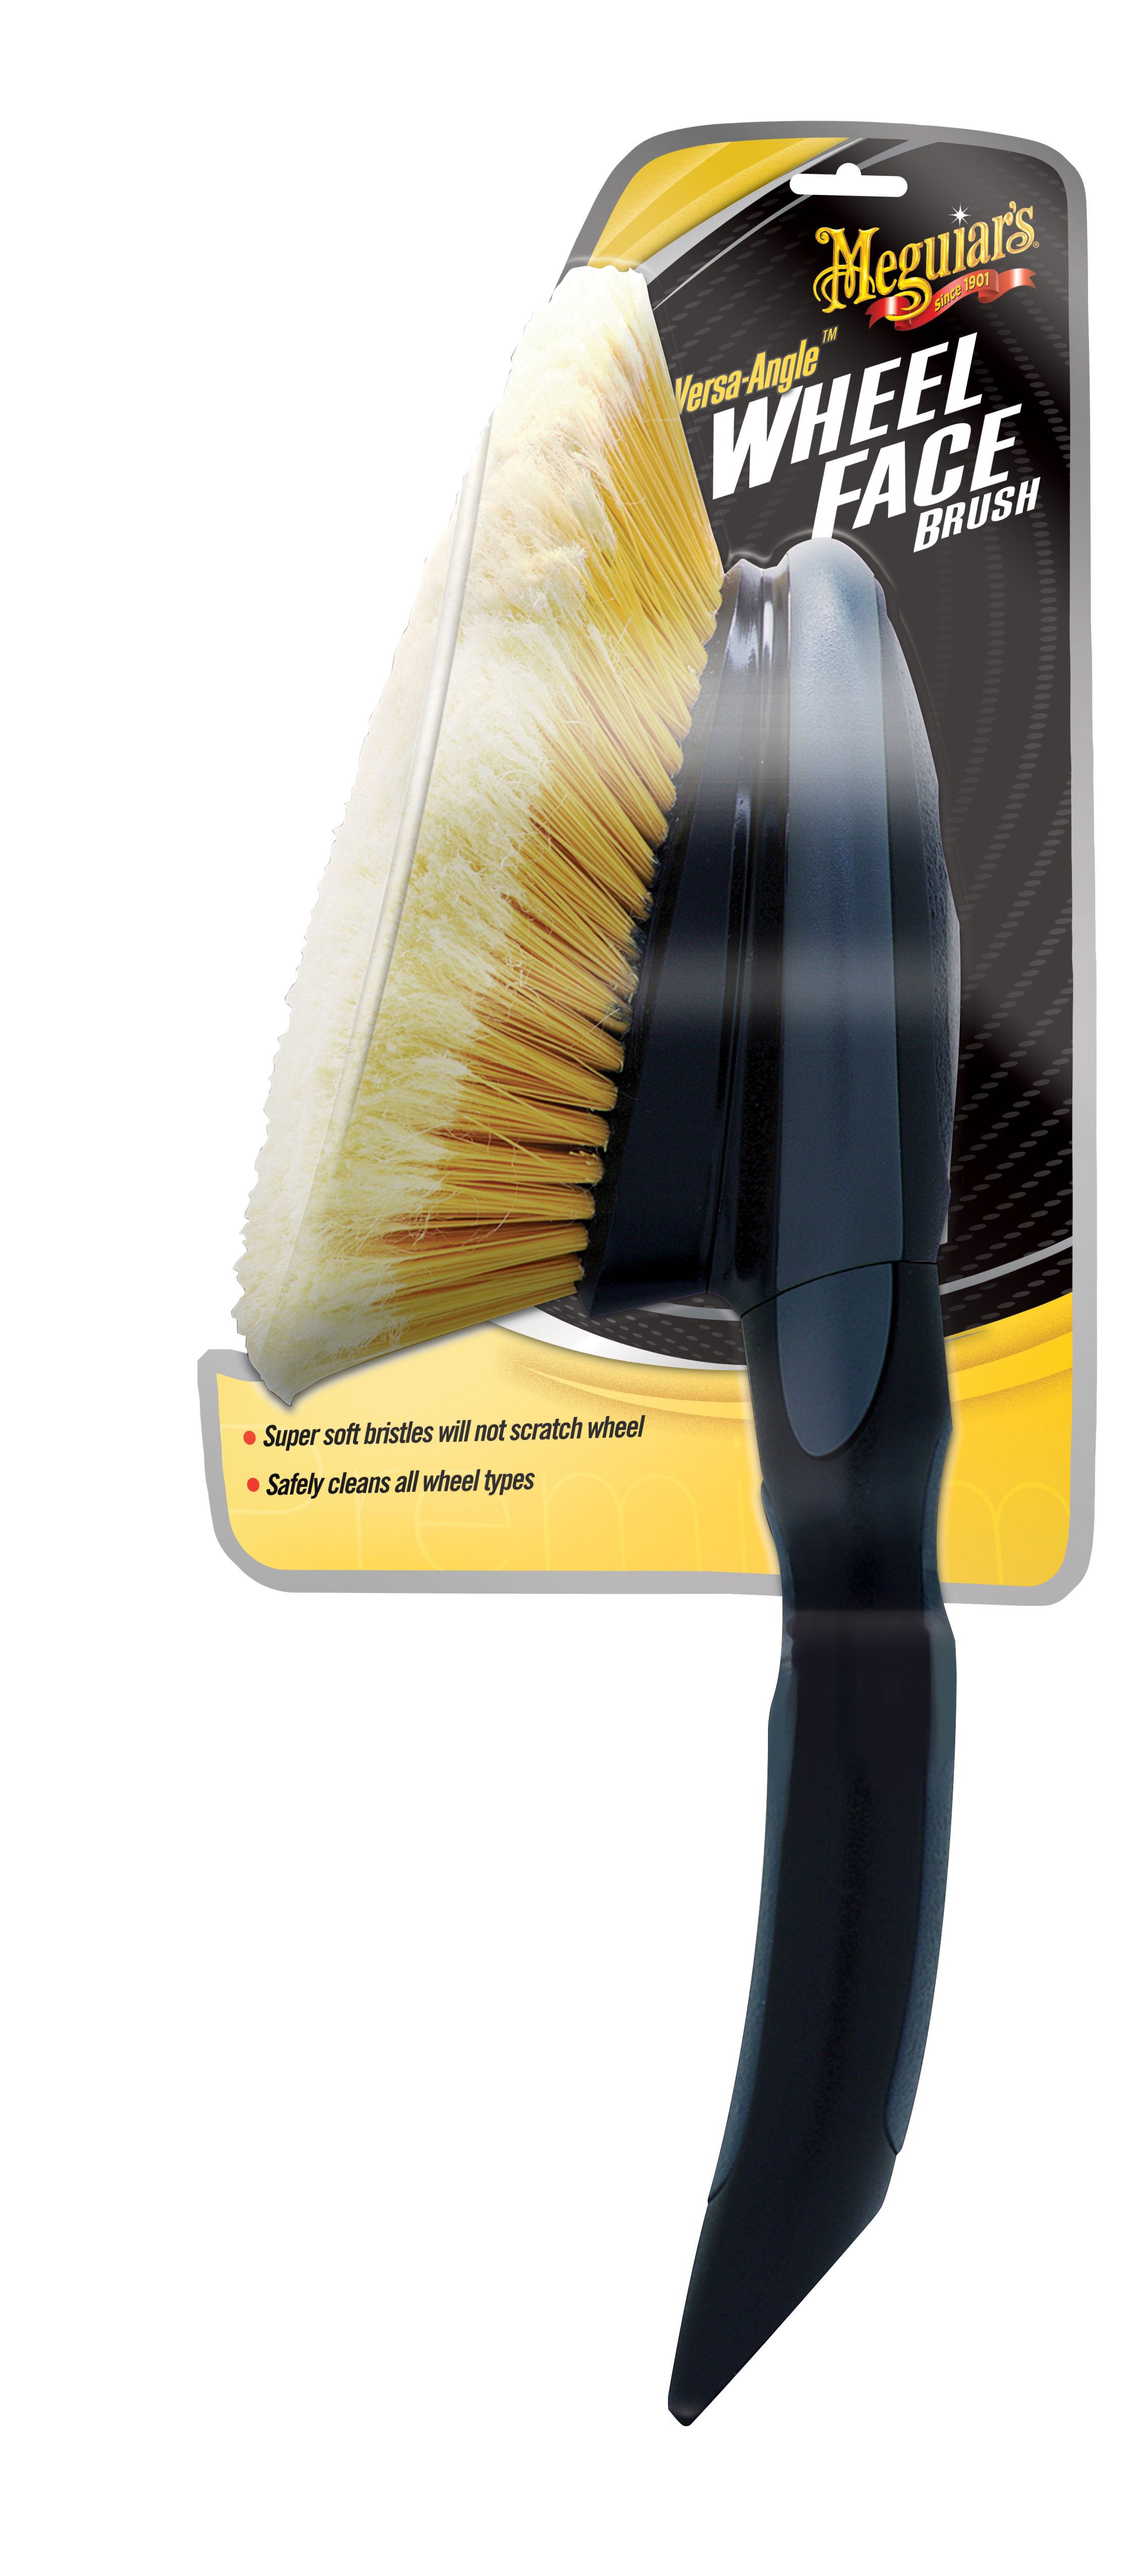 Meguiars Felgenbürste Autowäsche Versa Angle Wheel Face Brush Bürste X1025EU